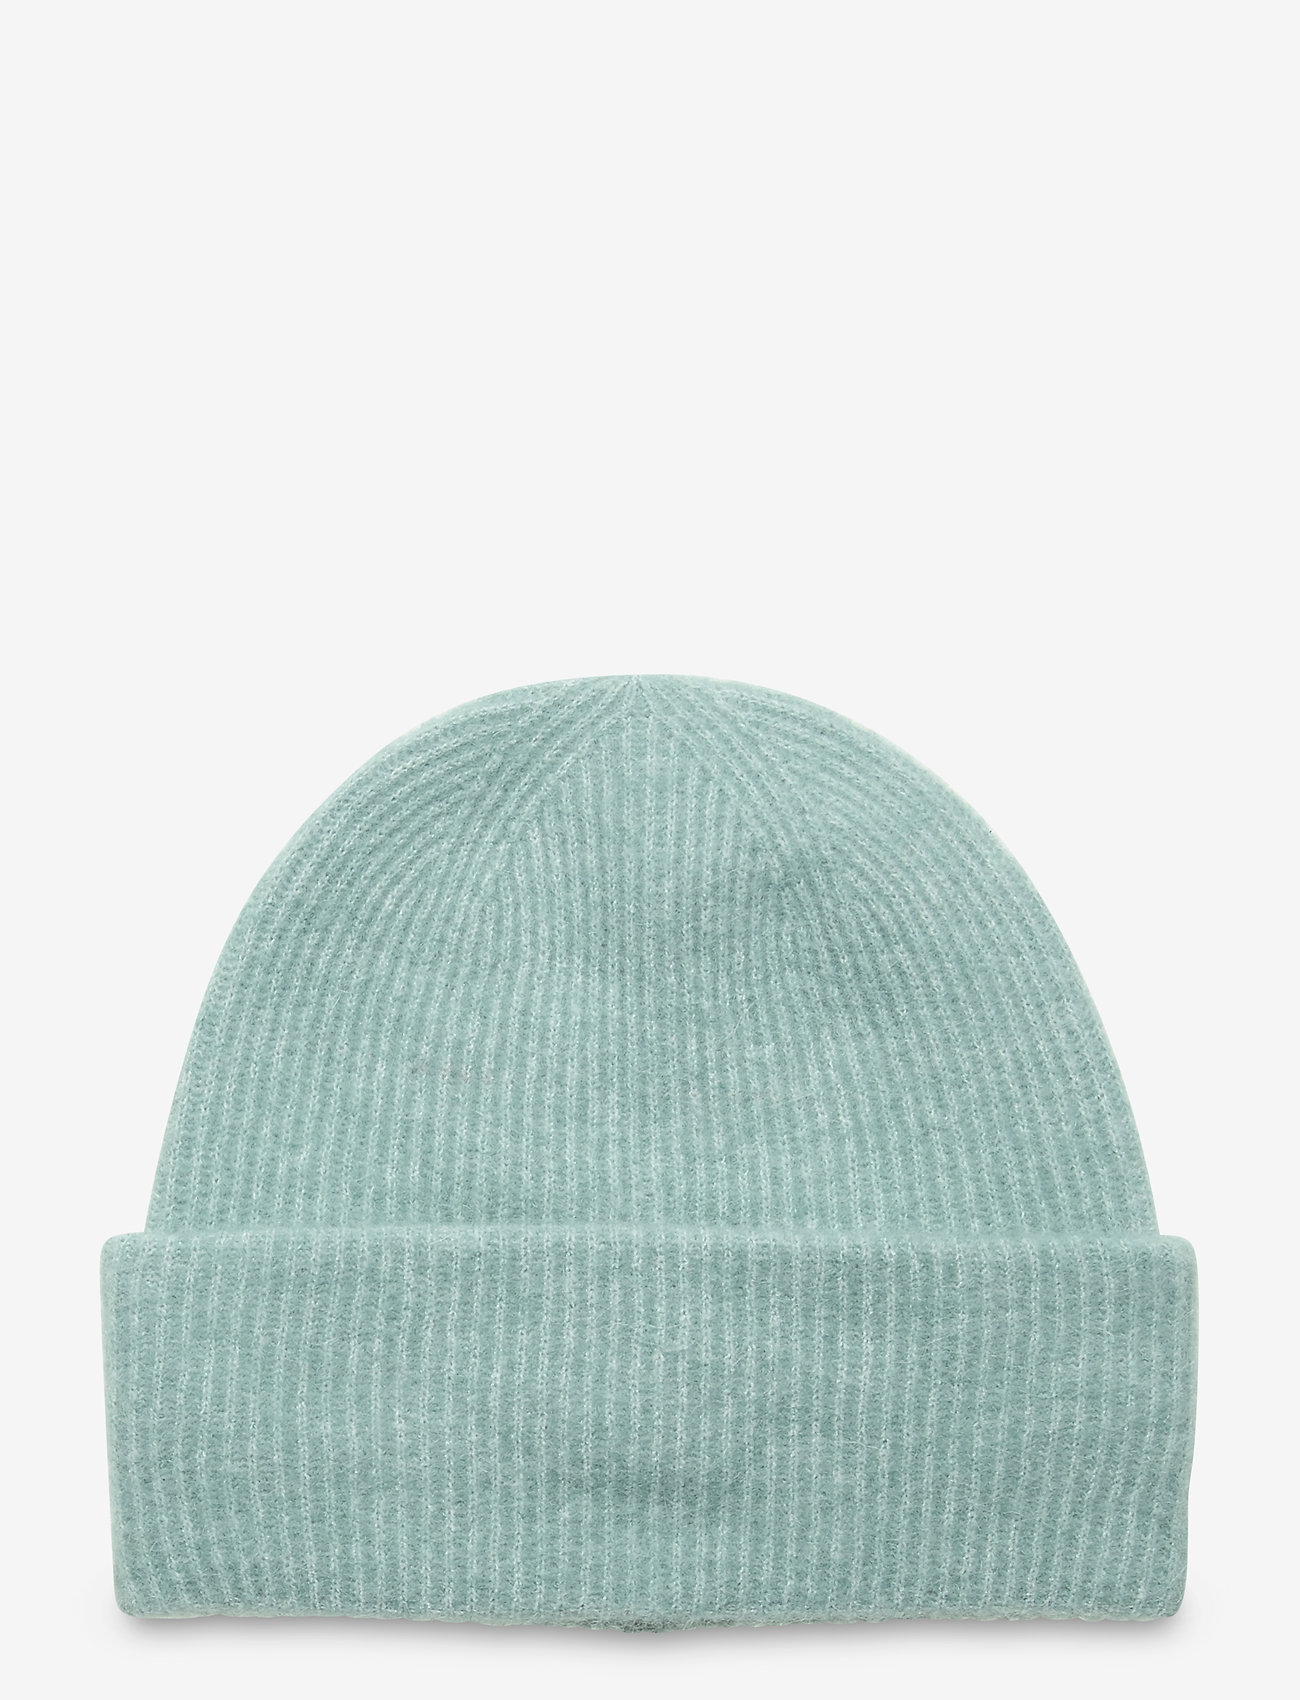 Samsøe Samsøe Nor hat 7355 - Czapki i kapelusze OIL BLUE MEL. - Akcesoria